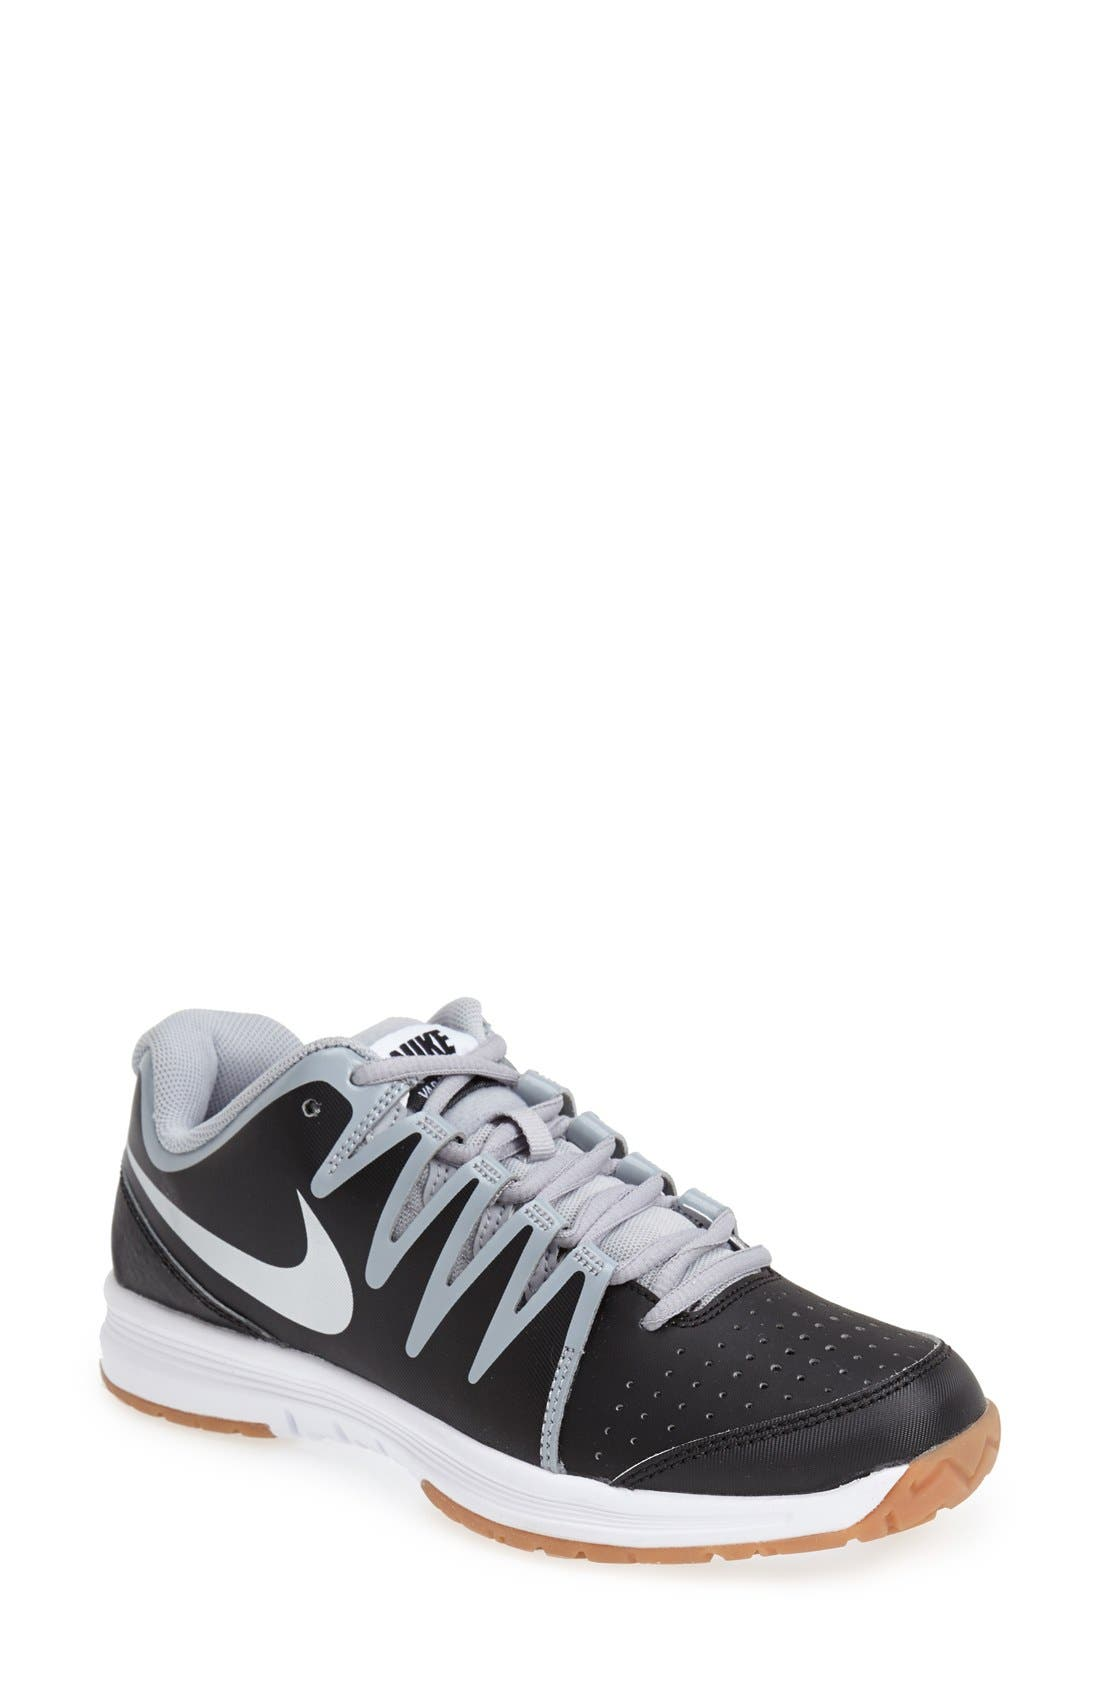 Alternate Image 1 Selected - Nike 'Air Vapor - Indoor Court' Tennis Shoe (Women)